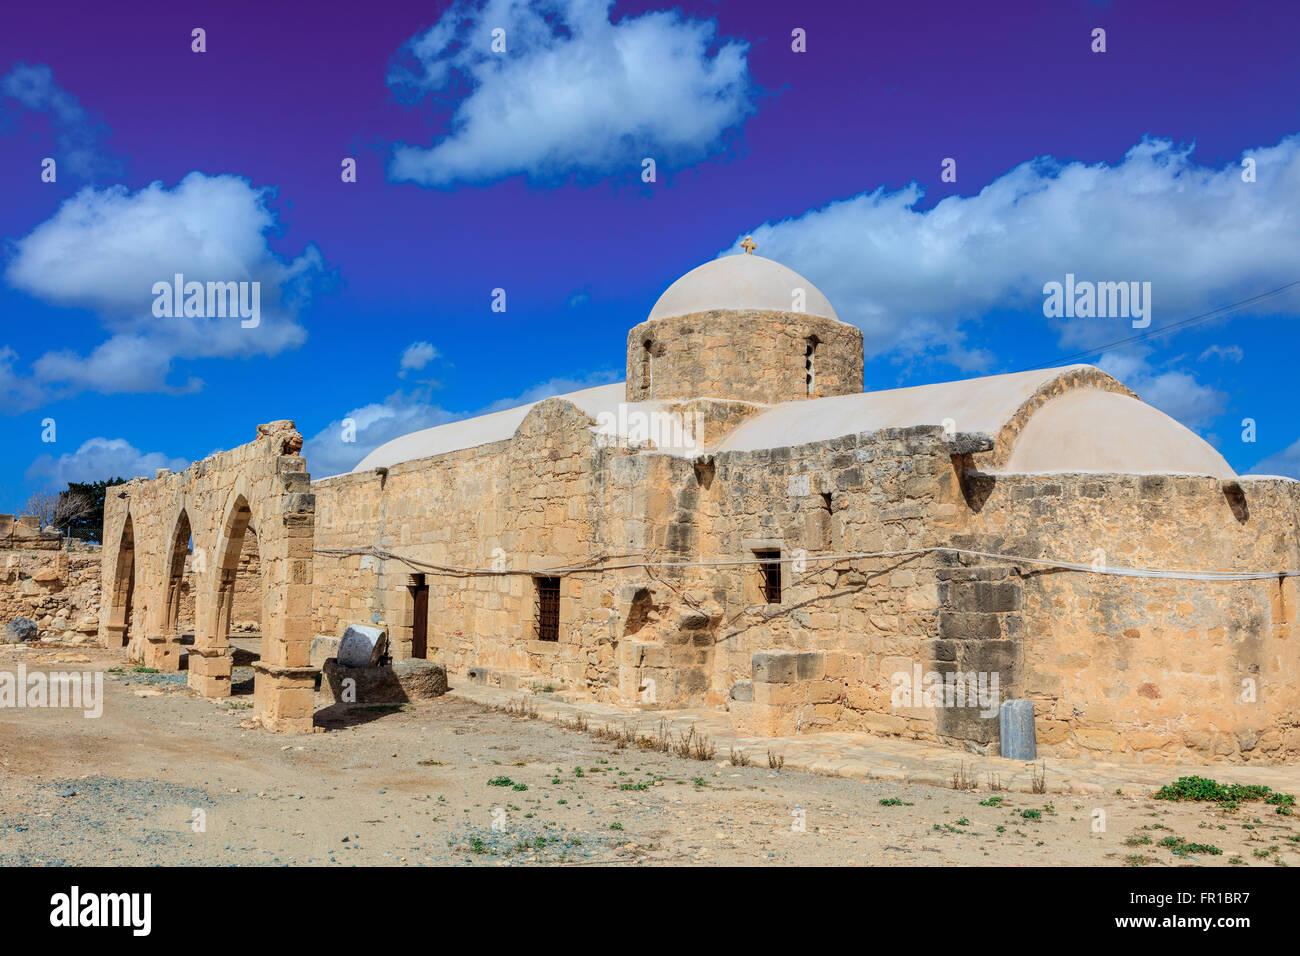 Antica chiesa di 'Panagia Odigitria' (Guida di Beata Vergine Maria) di Cipro. Immagini Stock